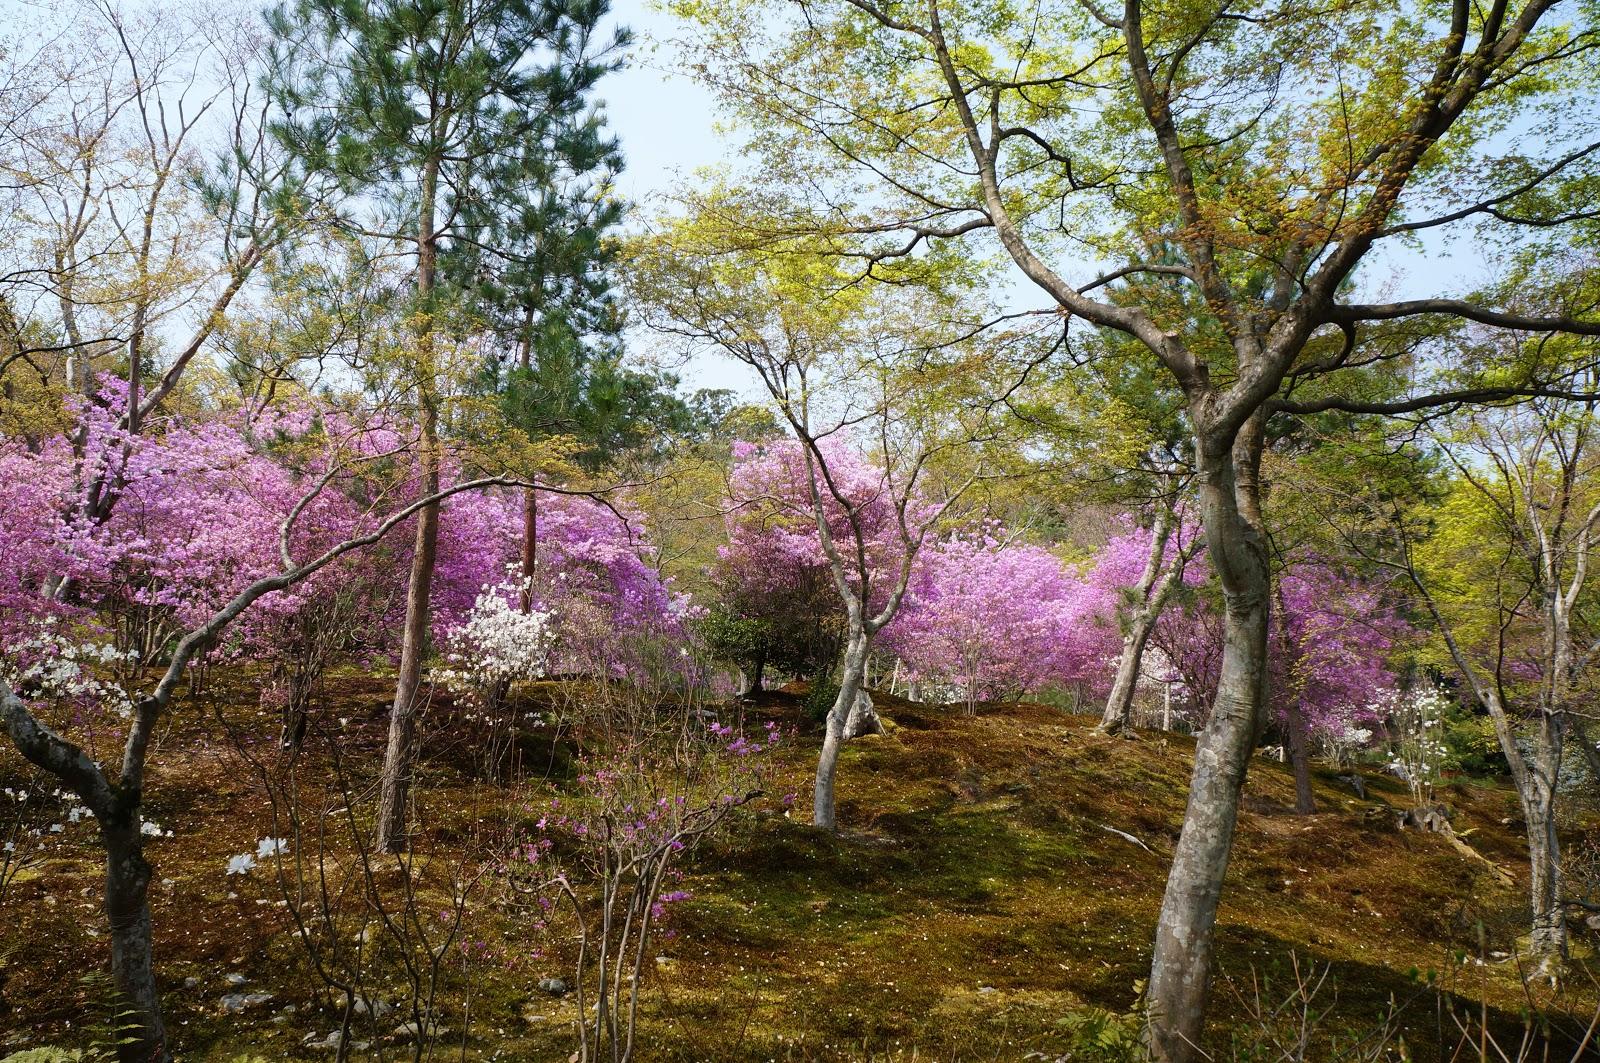 arashiyama, nijo castle and kyoto | travelling allrite